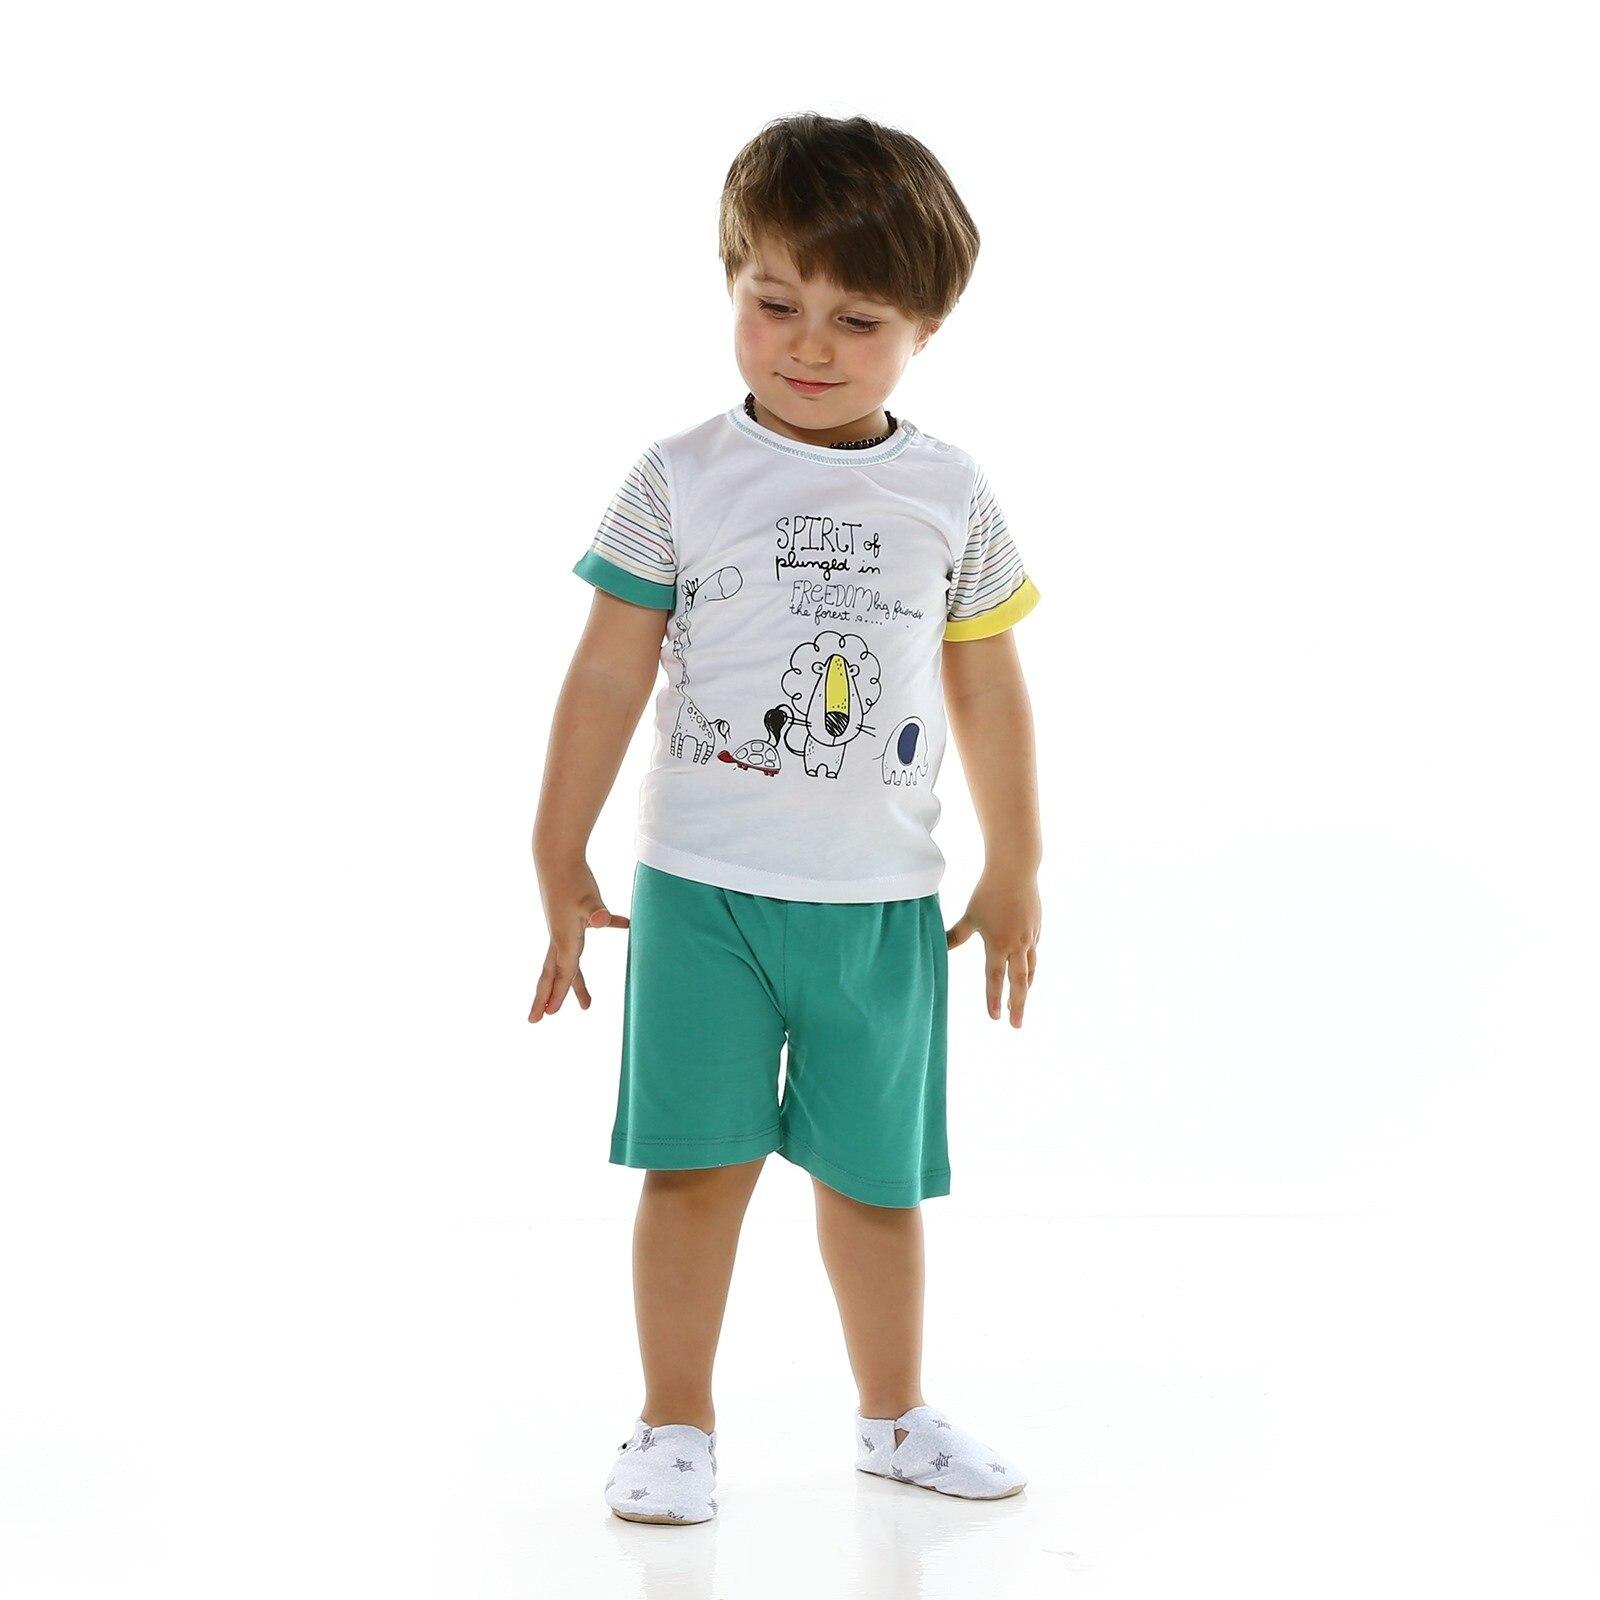 Ebebek HelloBaby Baby Boy Safari Theme Short Tshirt Set